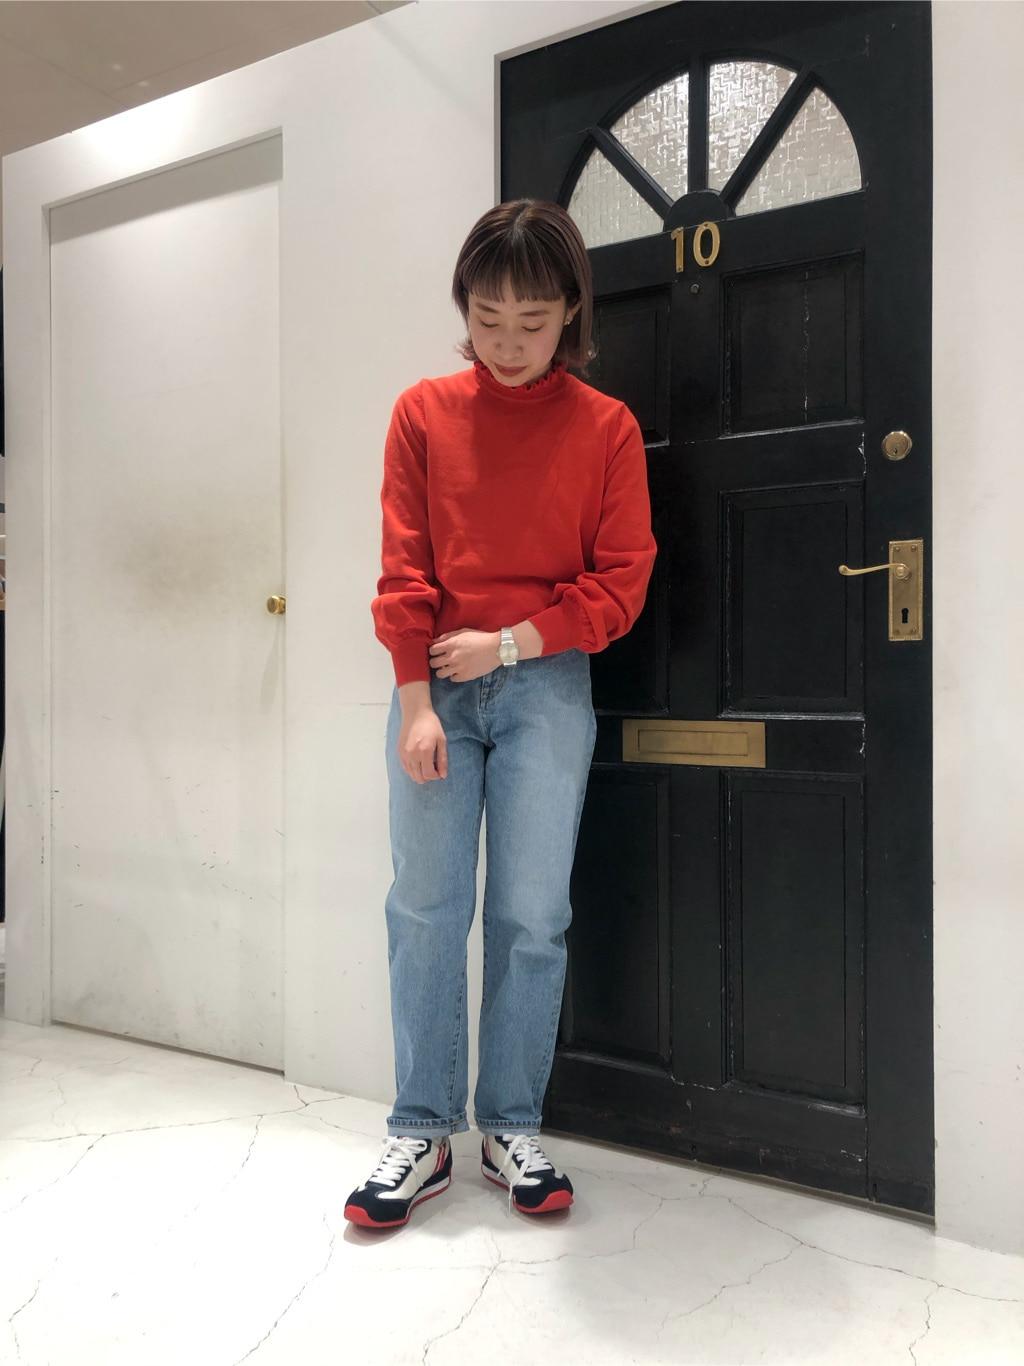 Dot and Stripes CHILD WOMAN ルクアイーレ 身長:157cm 2021.01.22